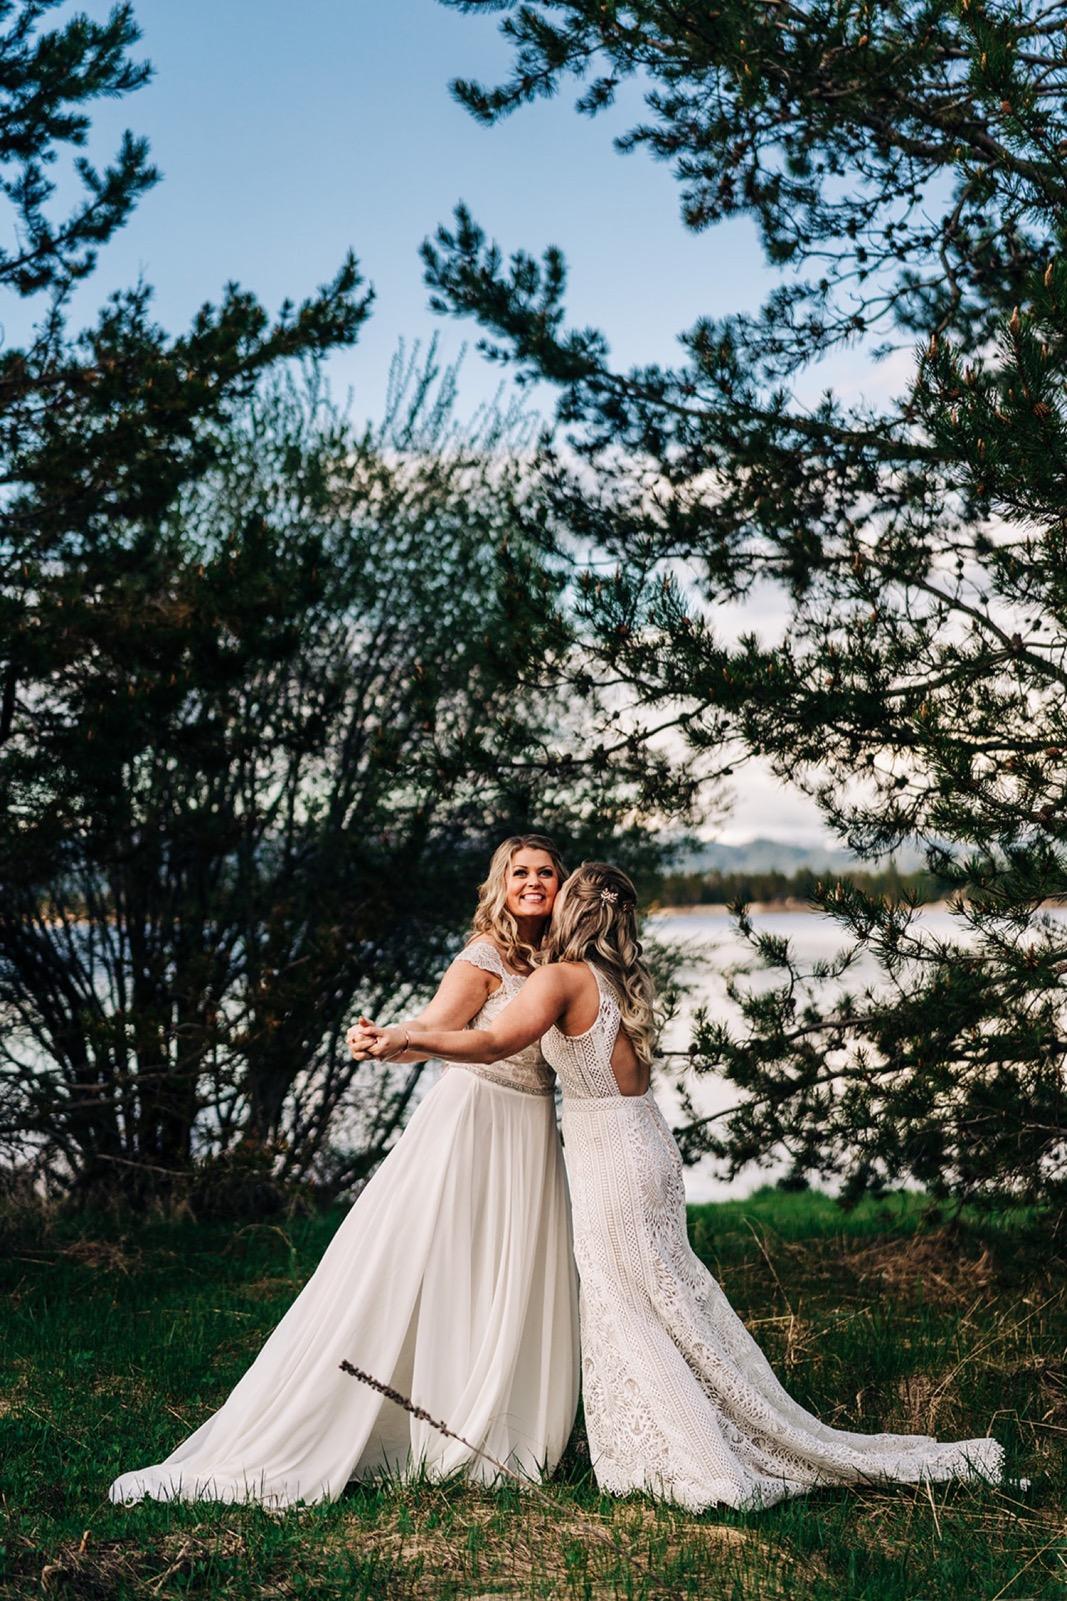 194_falissa_heather_wedding-546.jpg